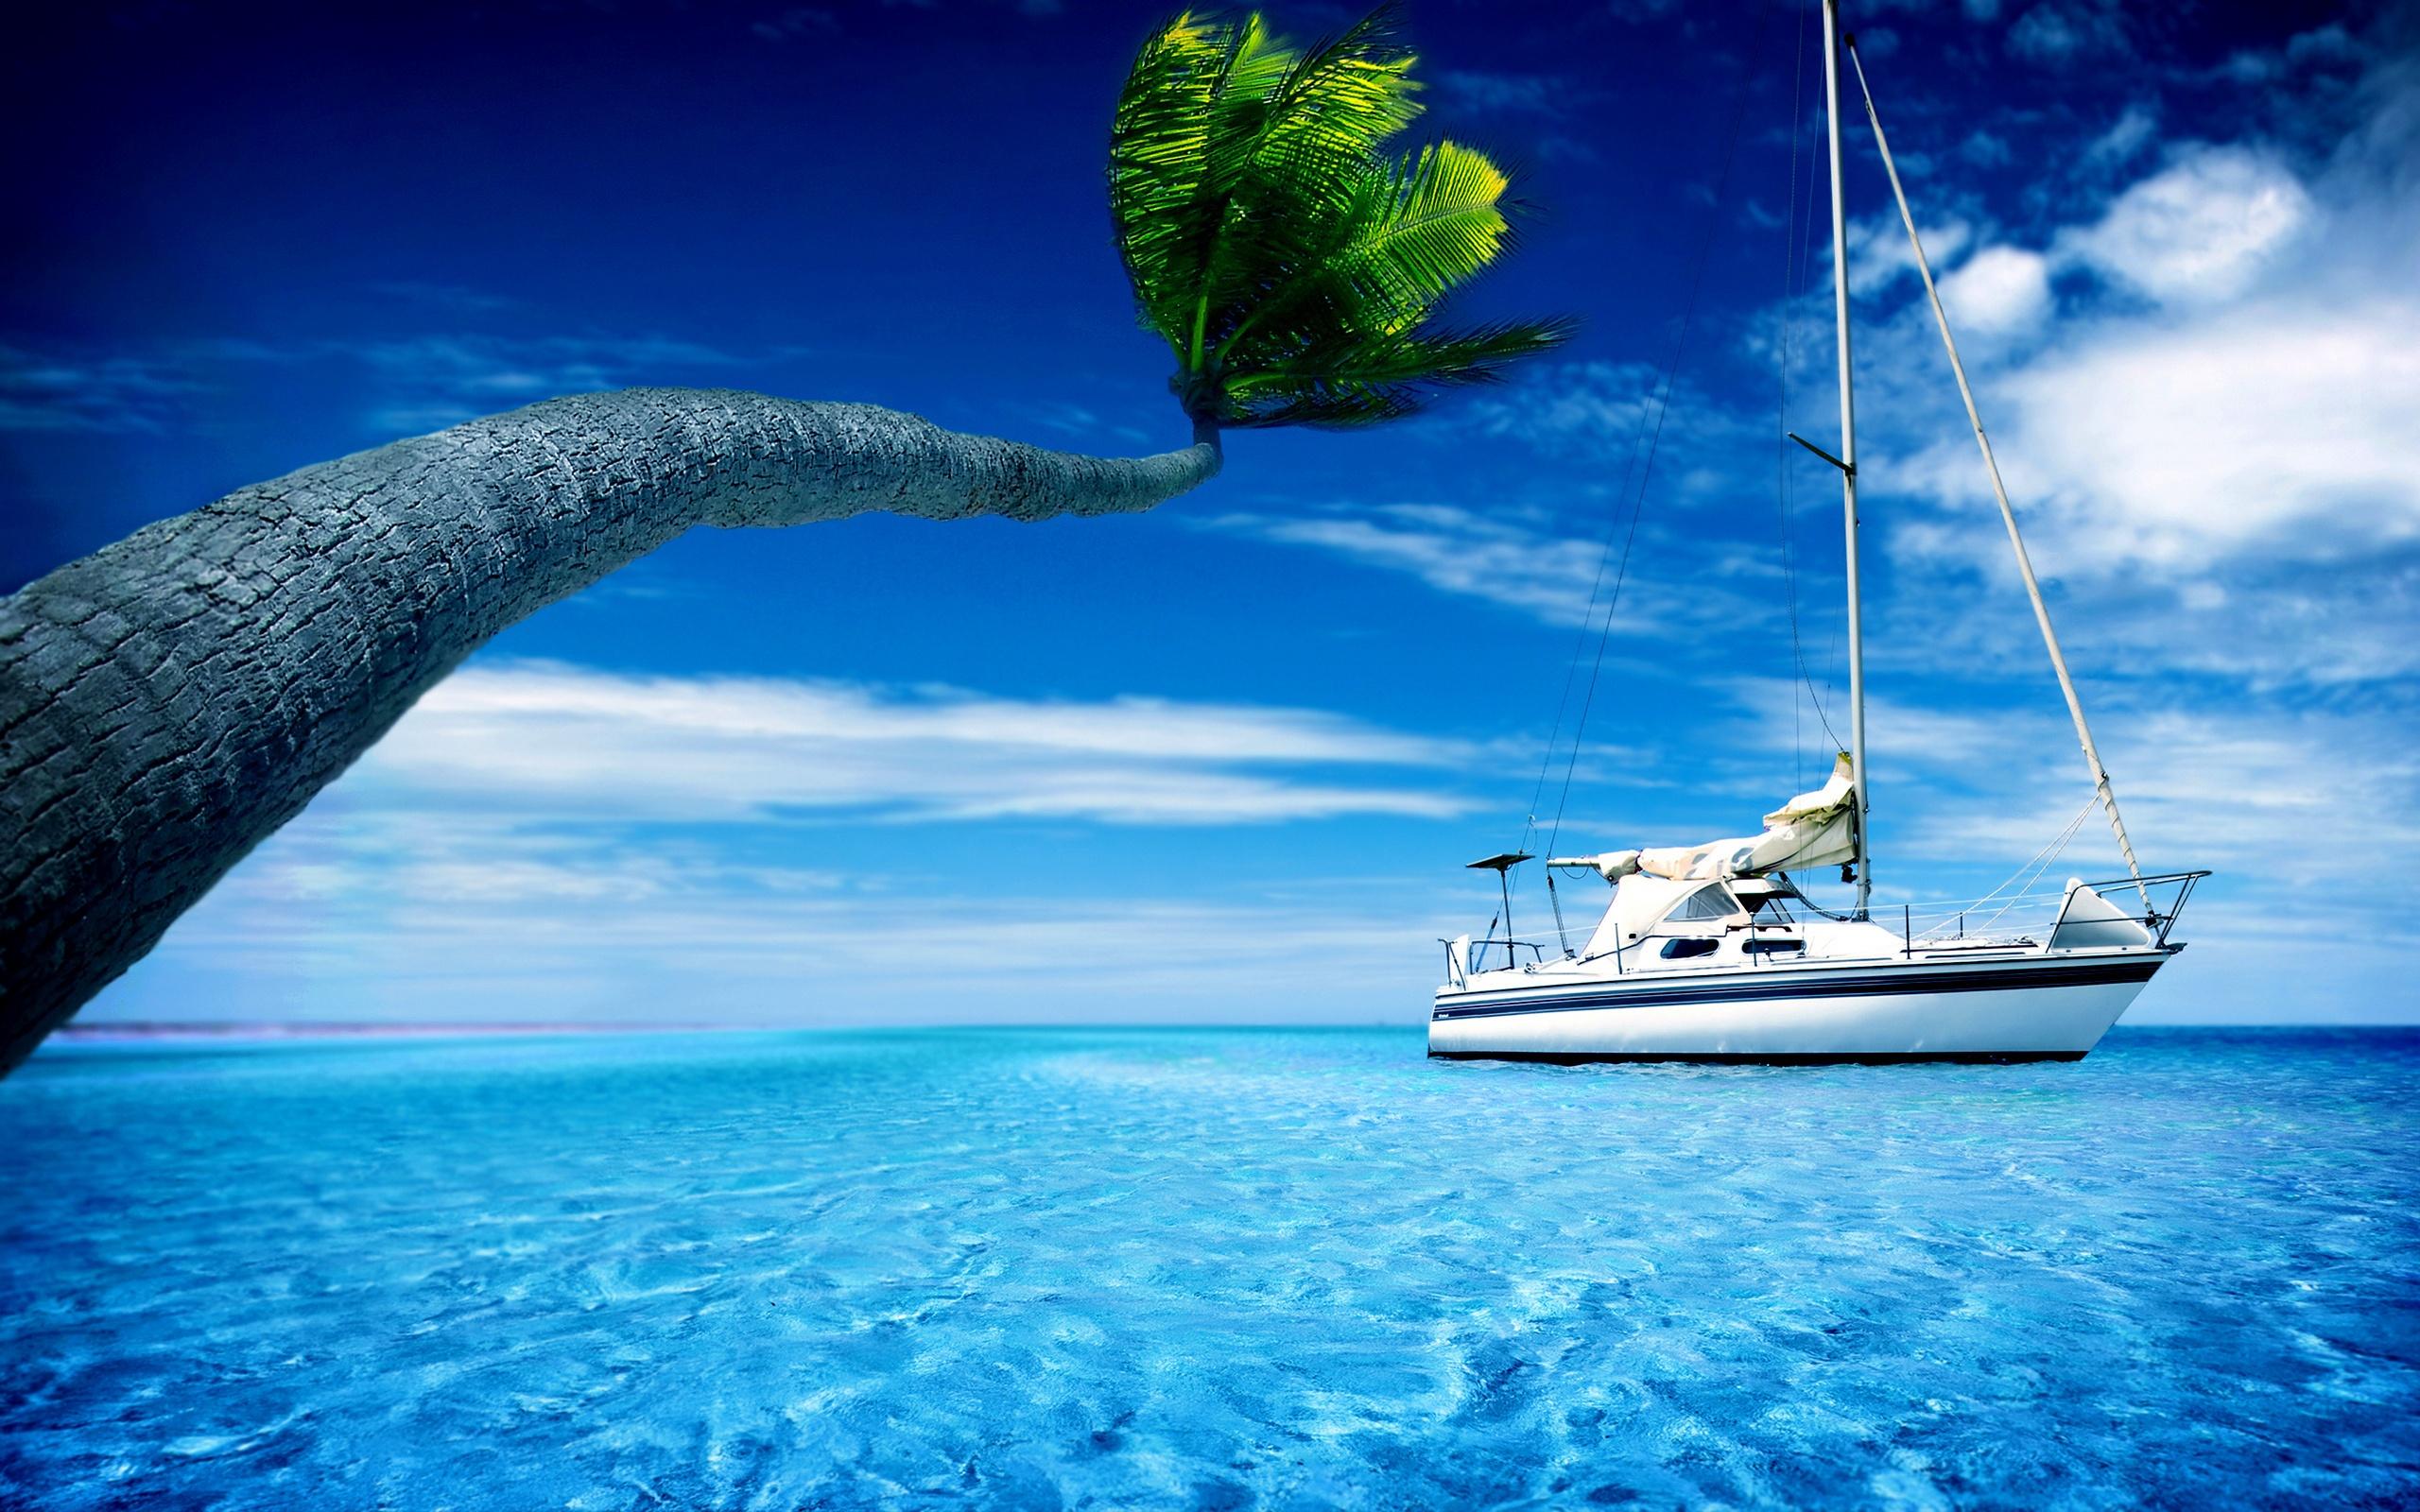 3840x2400 wallpaper ocean boat - photo #1